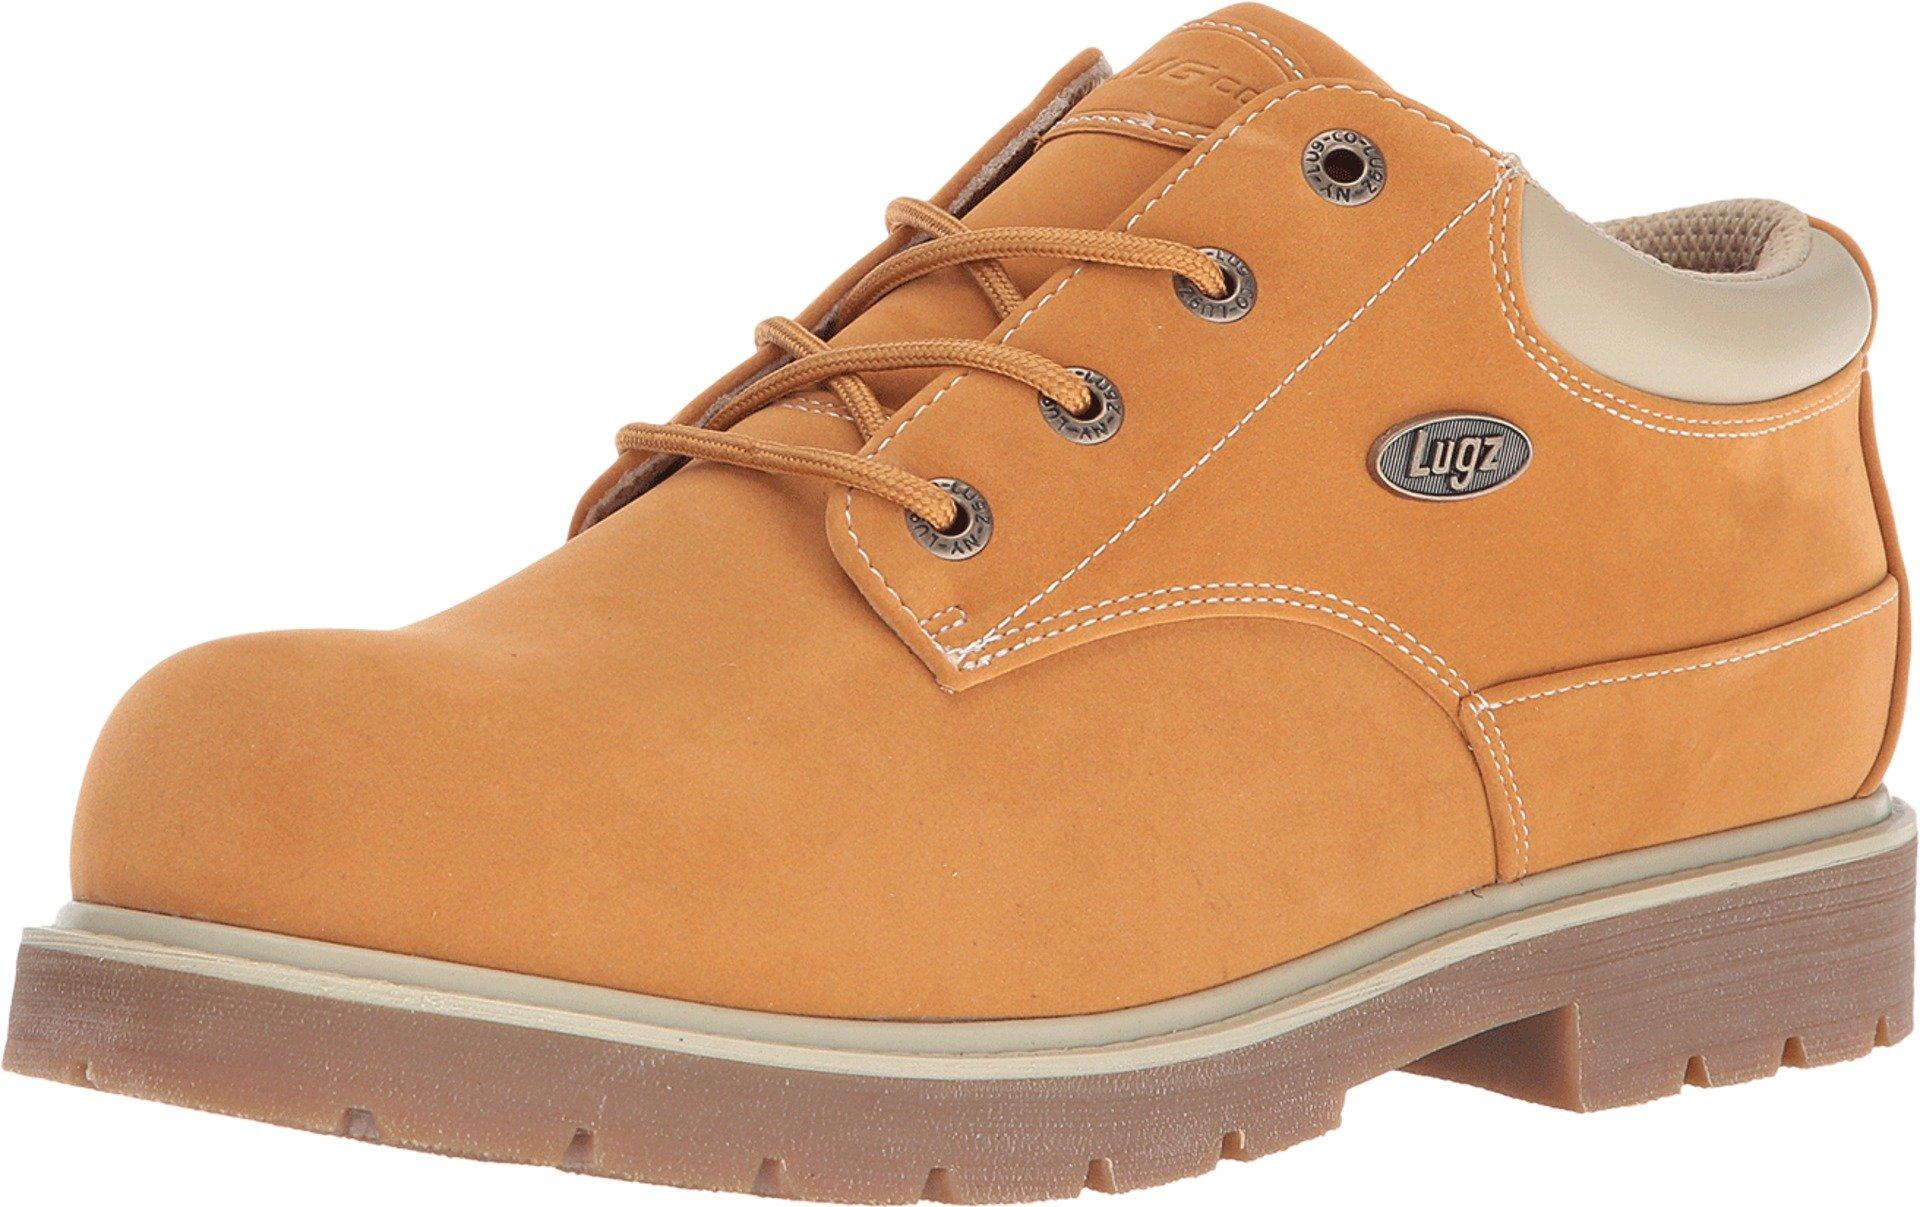 Lugz Men's Drifter Lo Lx Golden Wheat/Cream/Gum Shoe